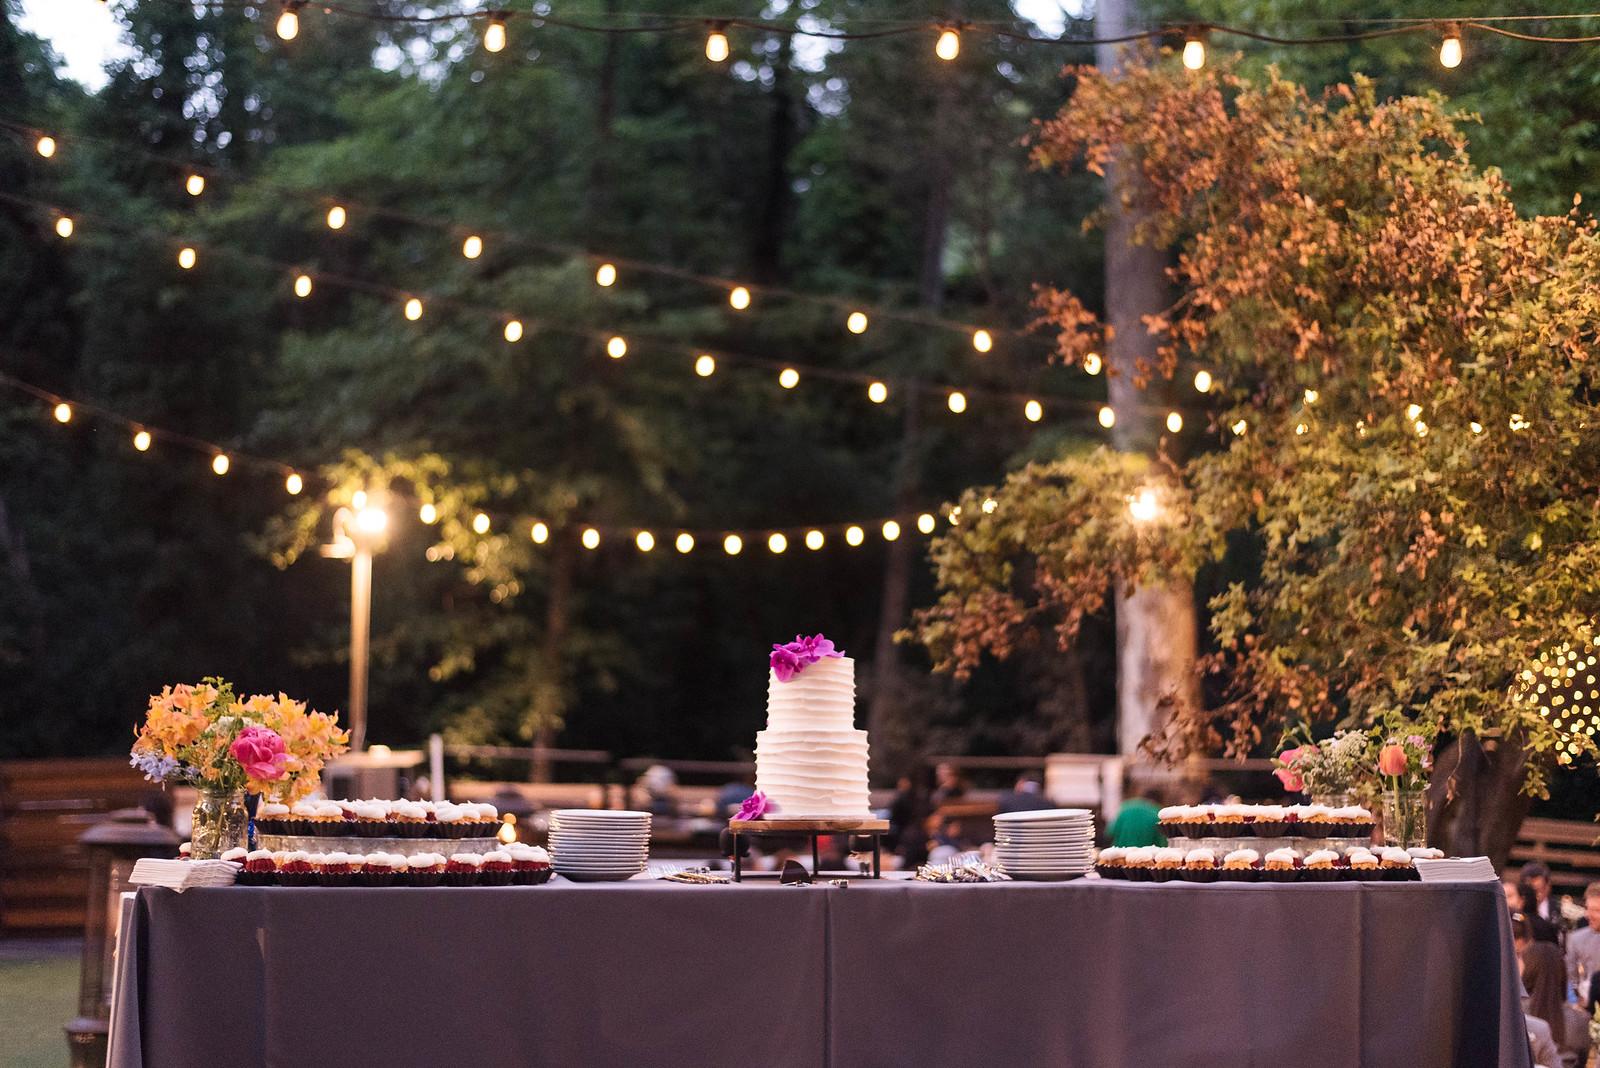 Cake Table Orchids Wedding on juliettelaura.com